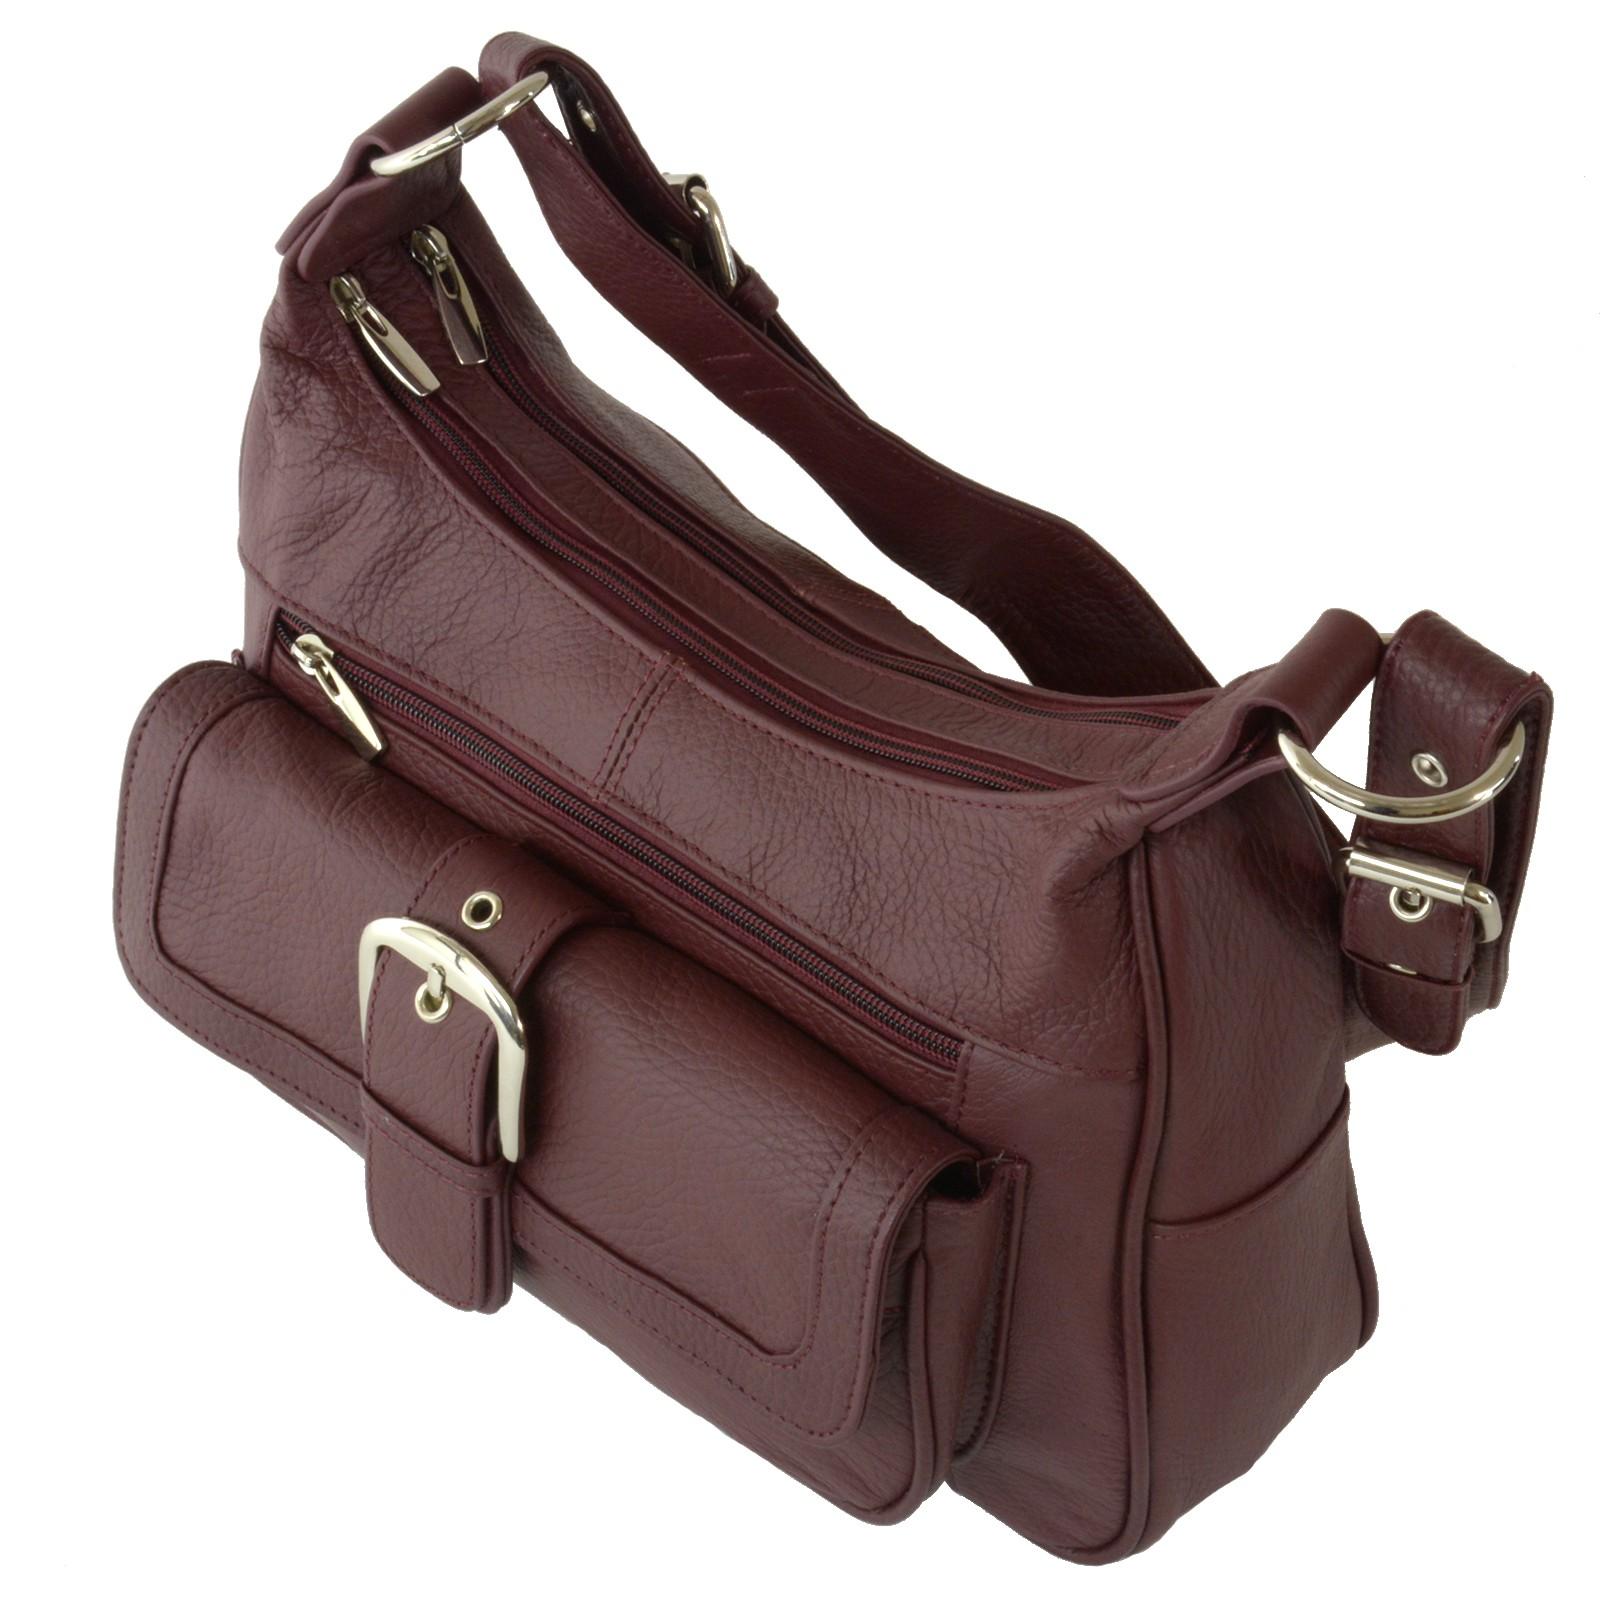 women u0026 39 s leather organizer purse multi pocket handbag shoulder bag satchel tote